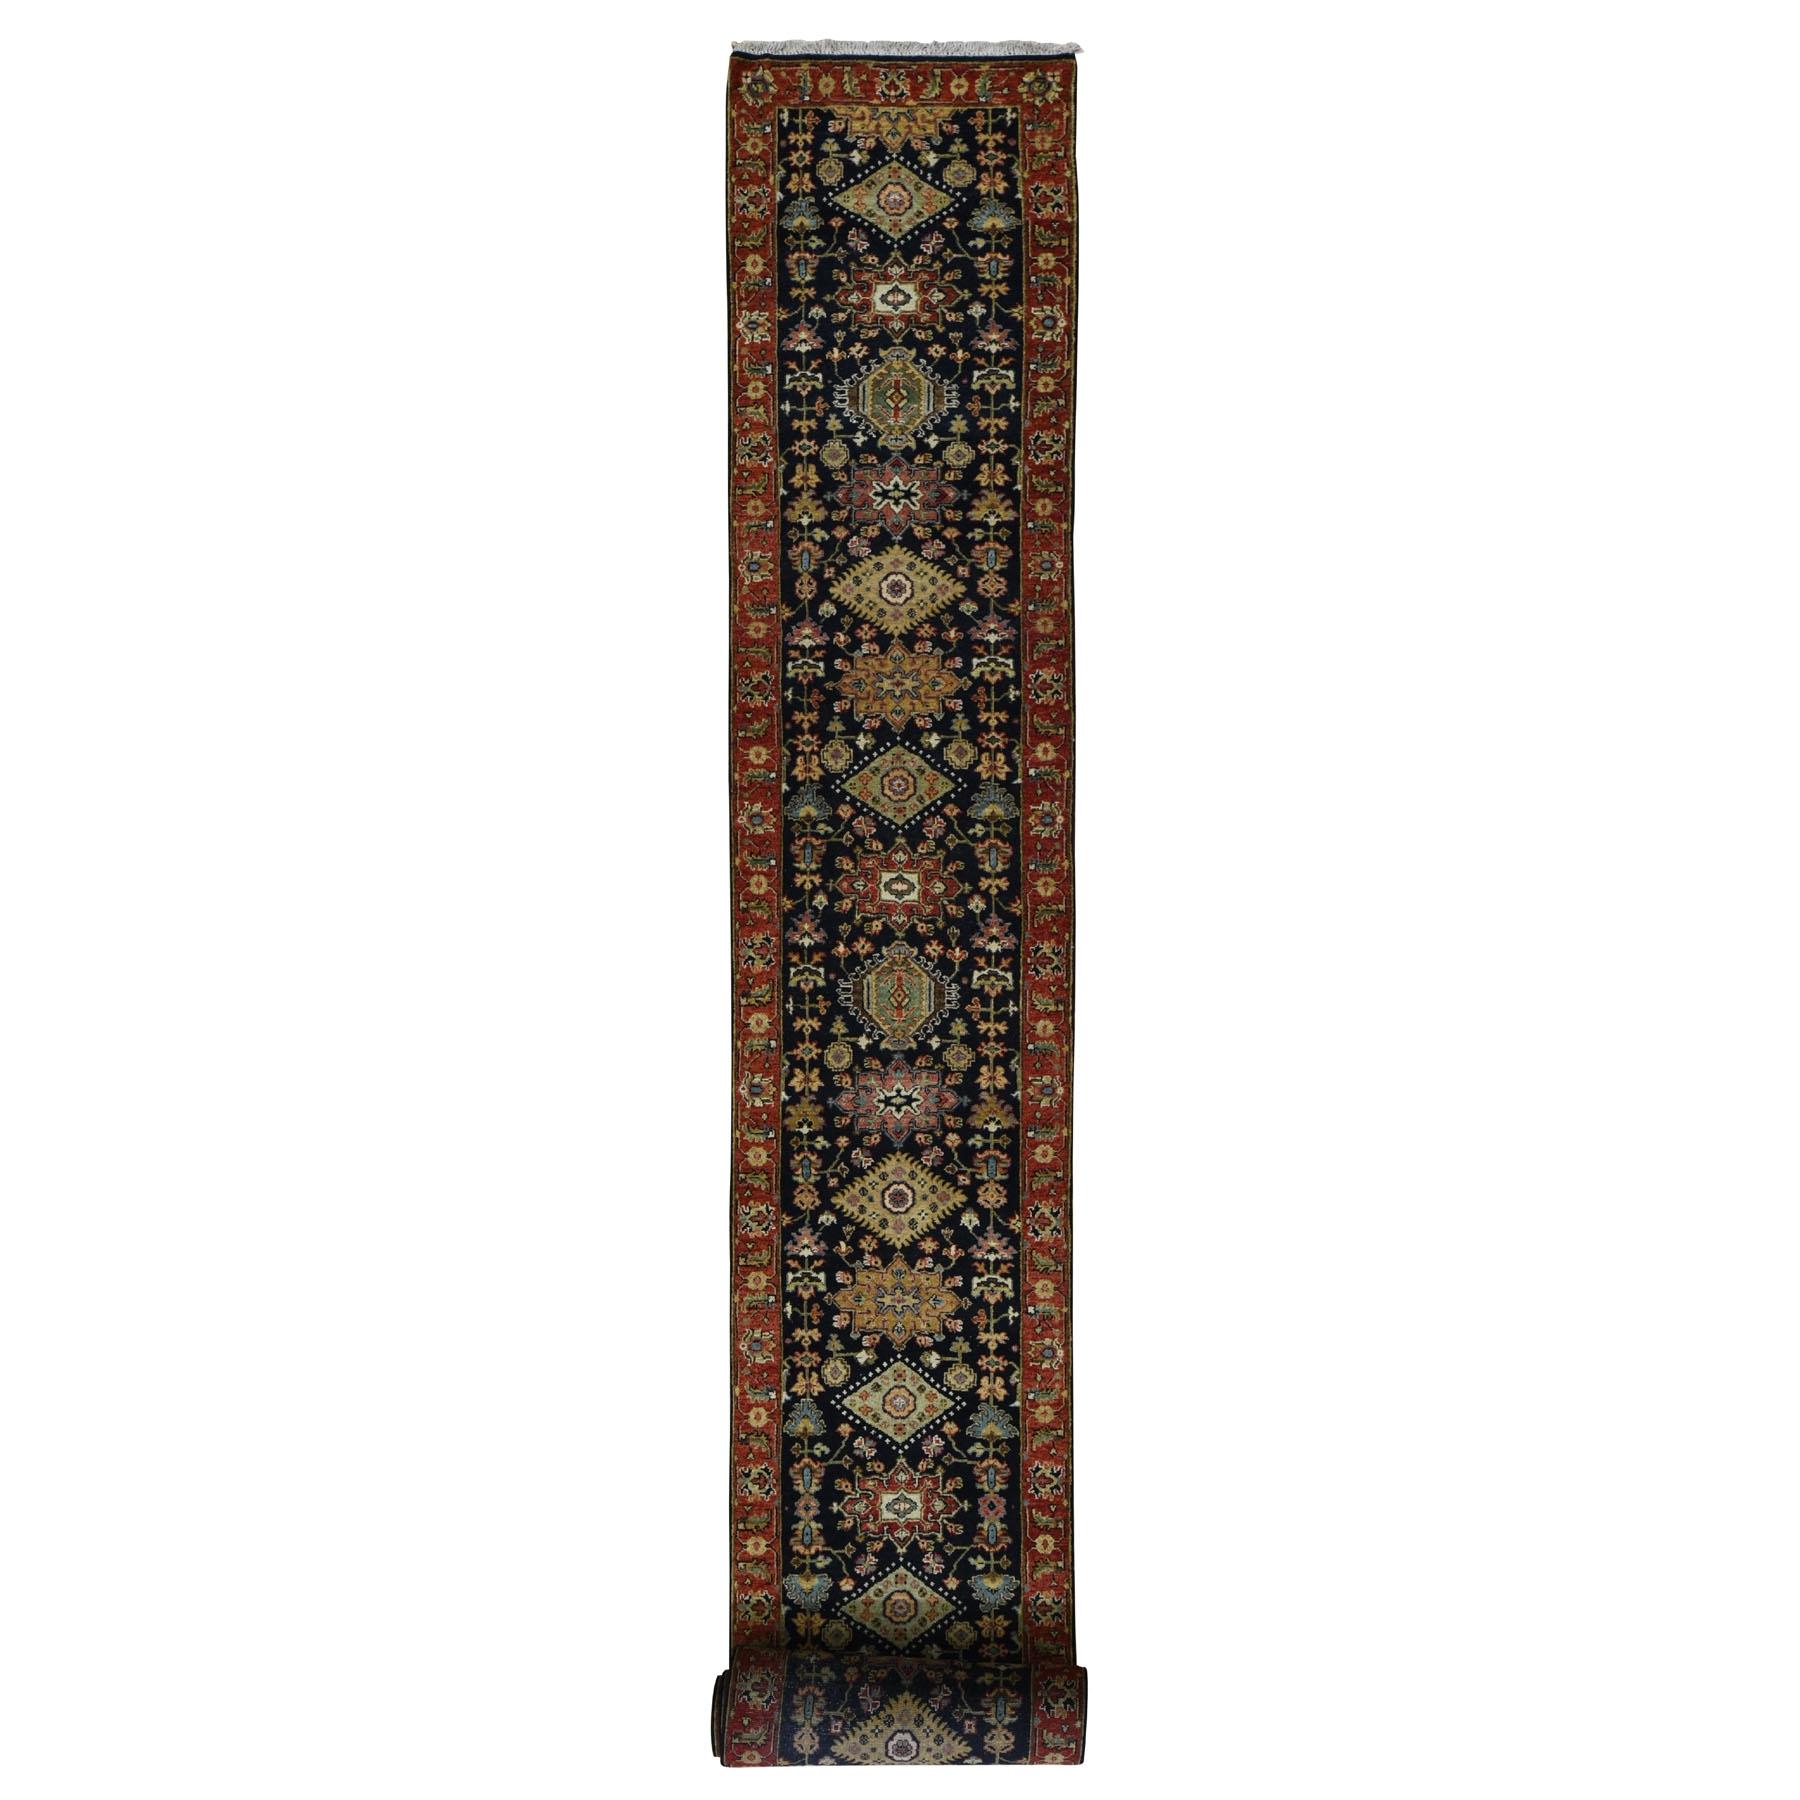 Serapi Heriz and Bakhshayesh Collection Hand Knotted Black Rug No: 0197954